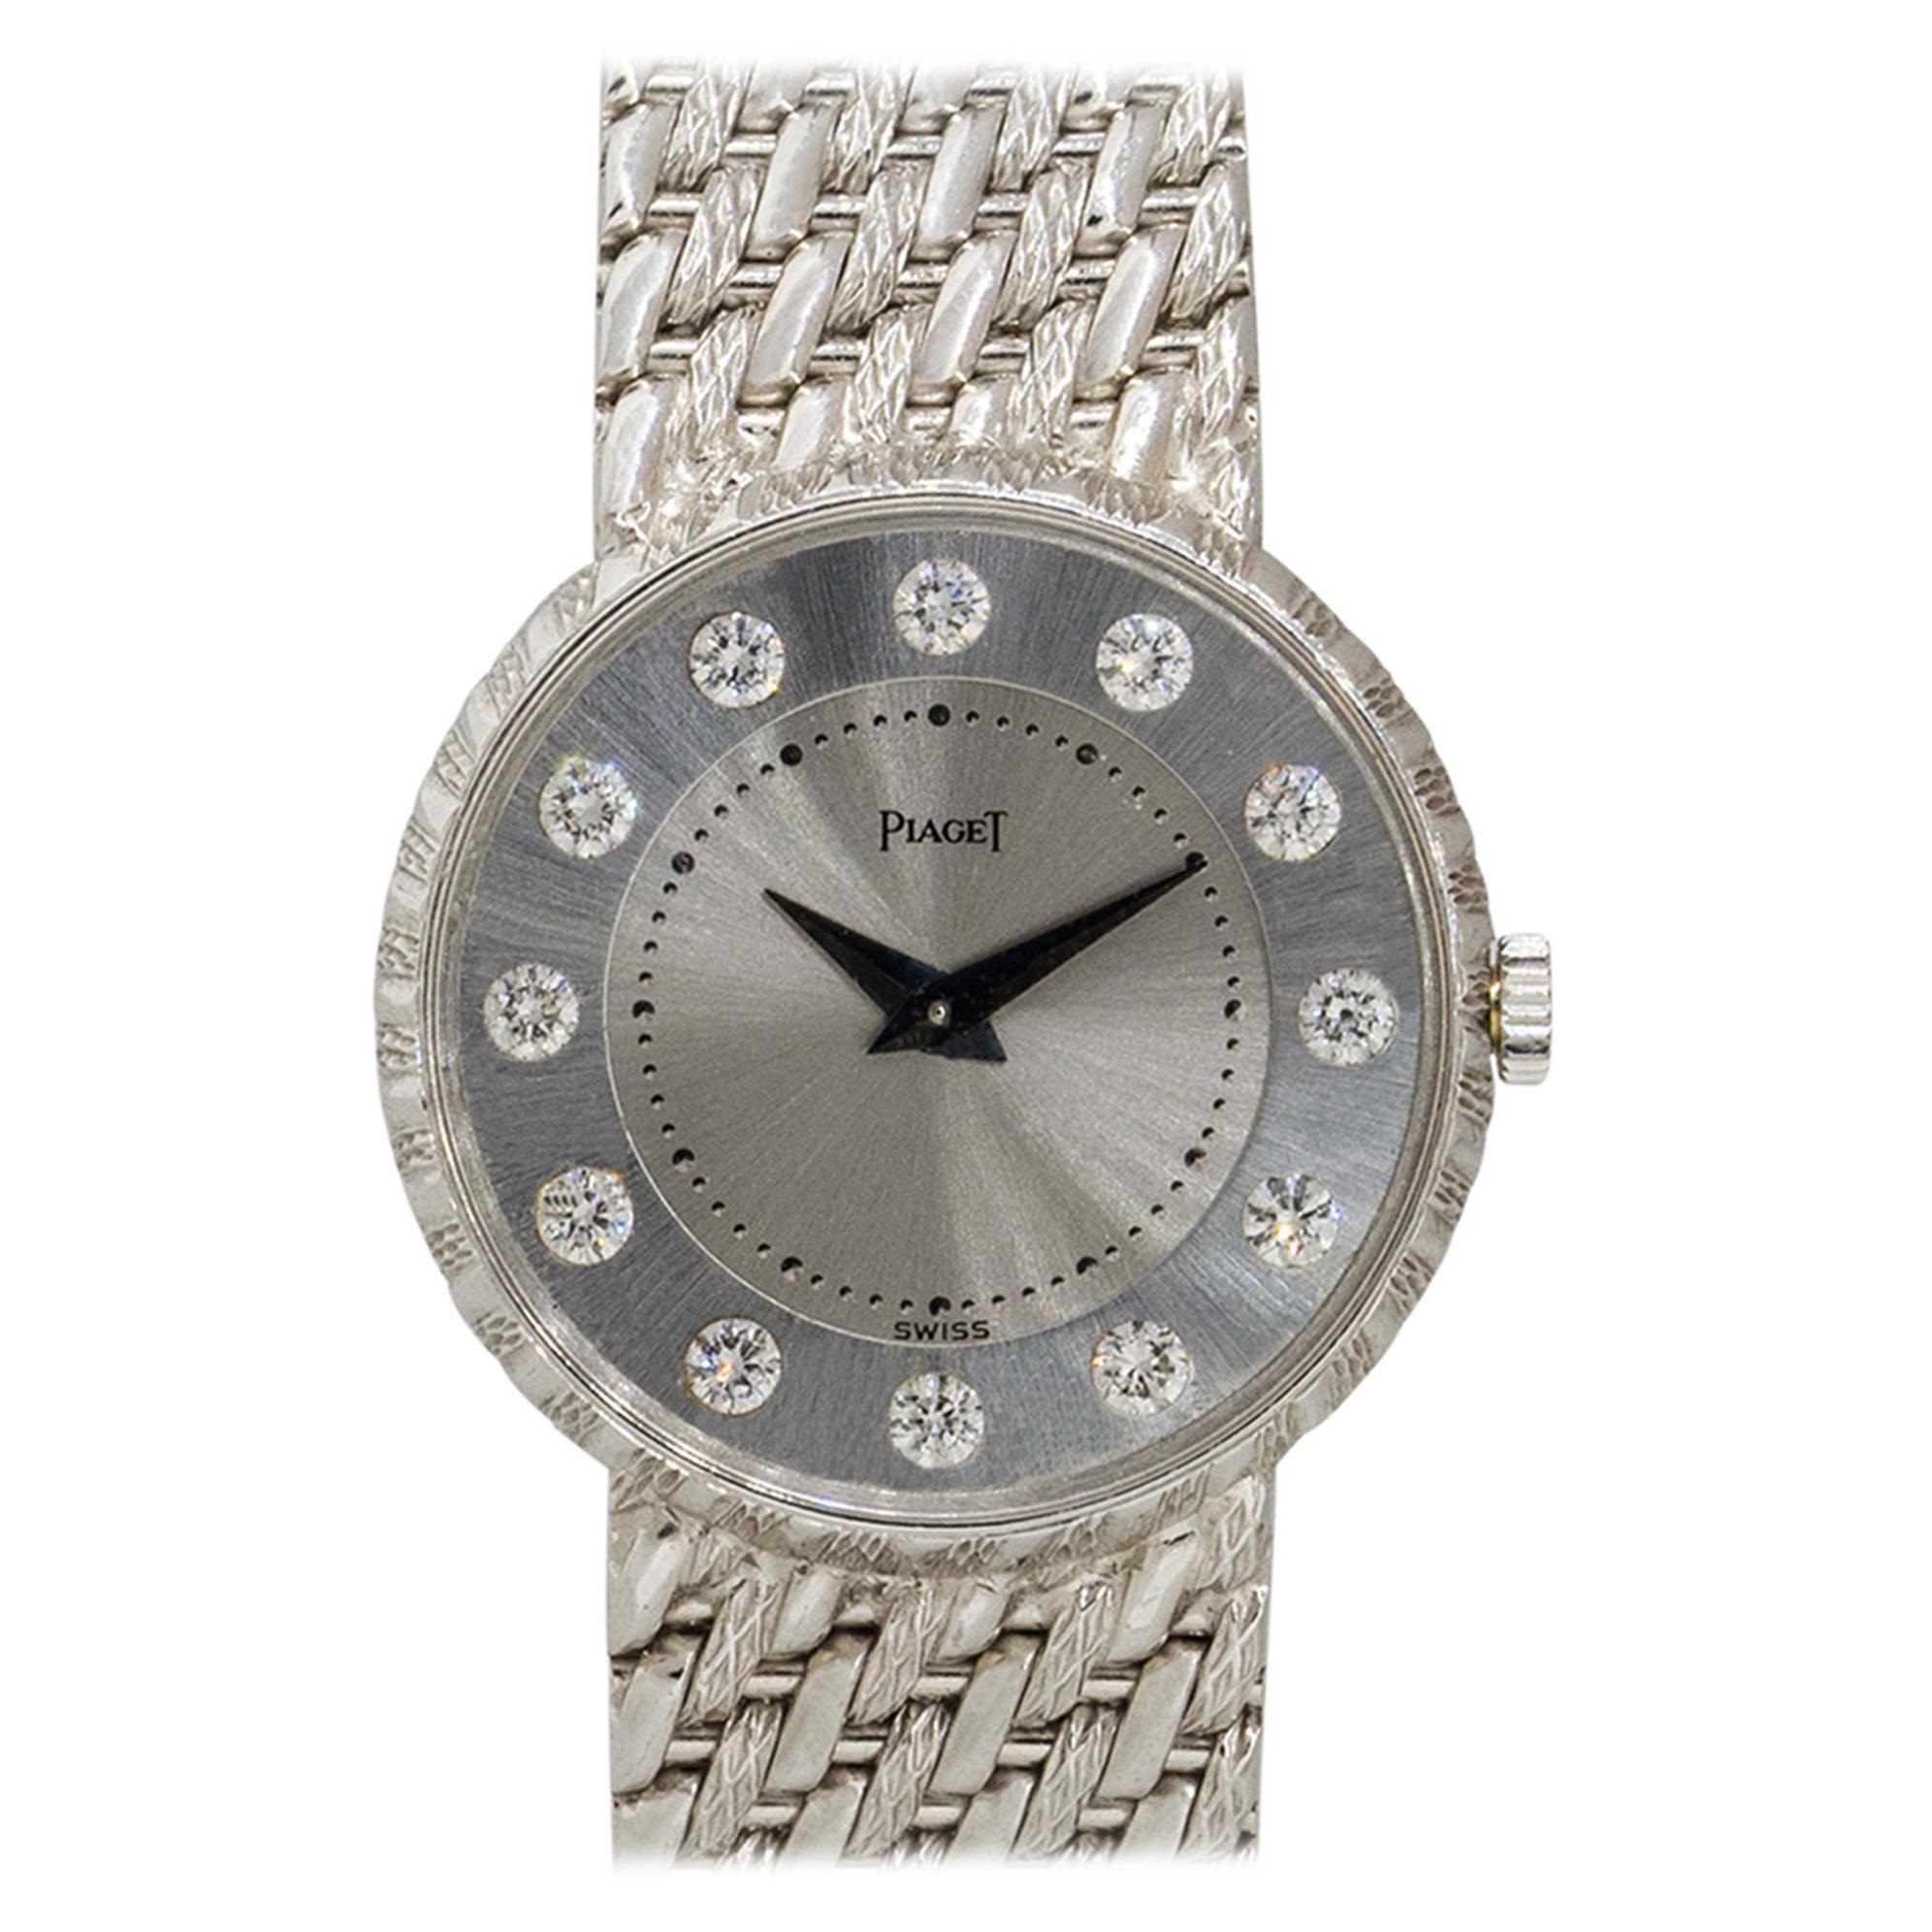 Piaget 4642P32 18k White Gold Silver Diamond Dial Ladies Watch